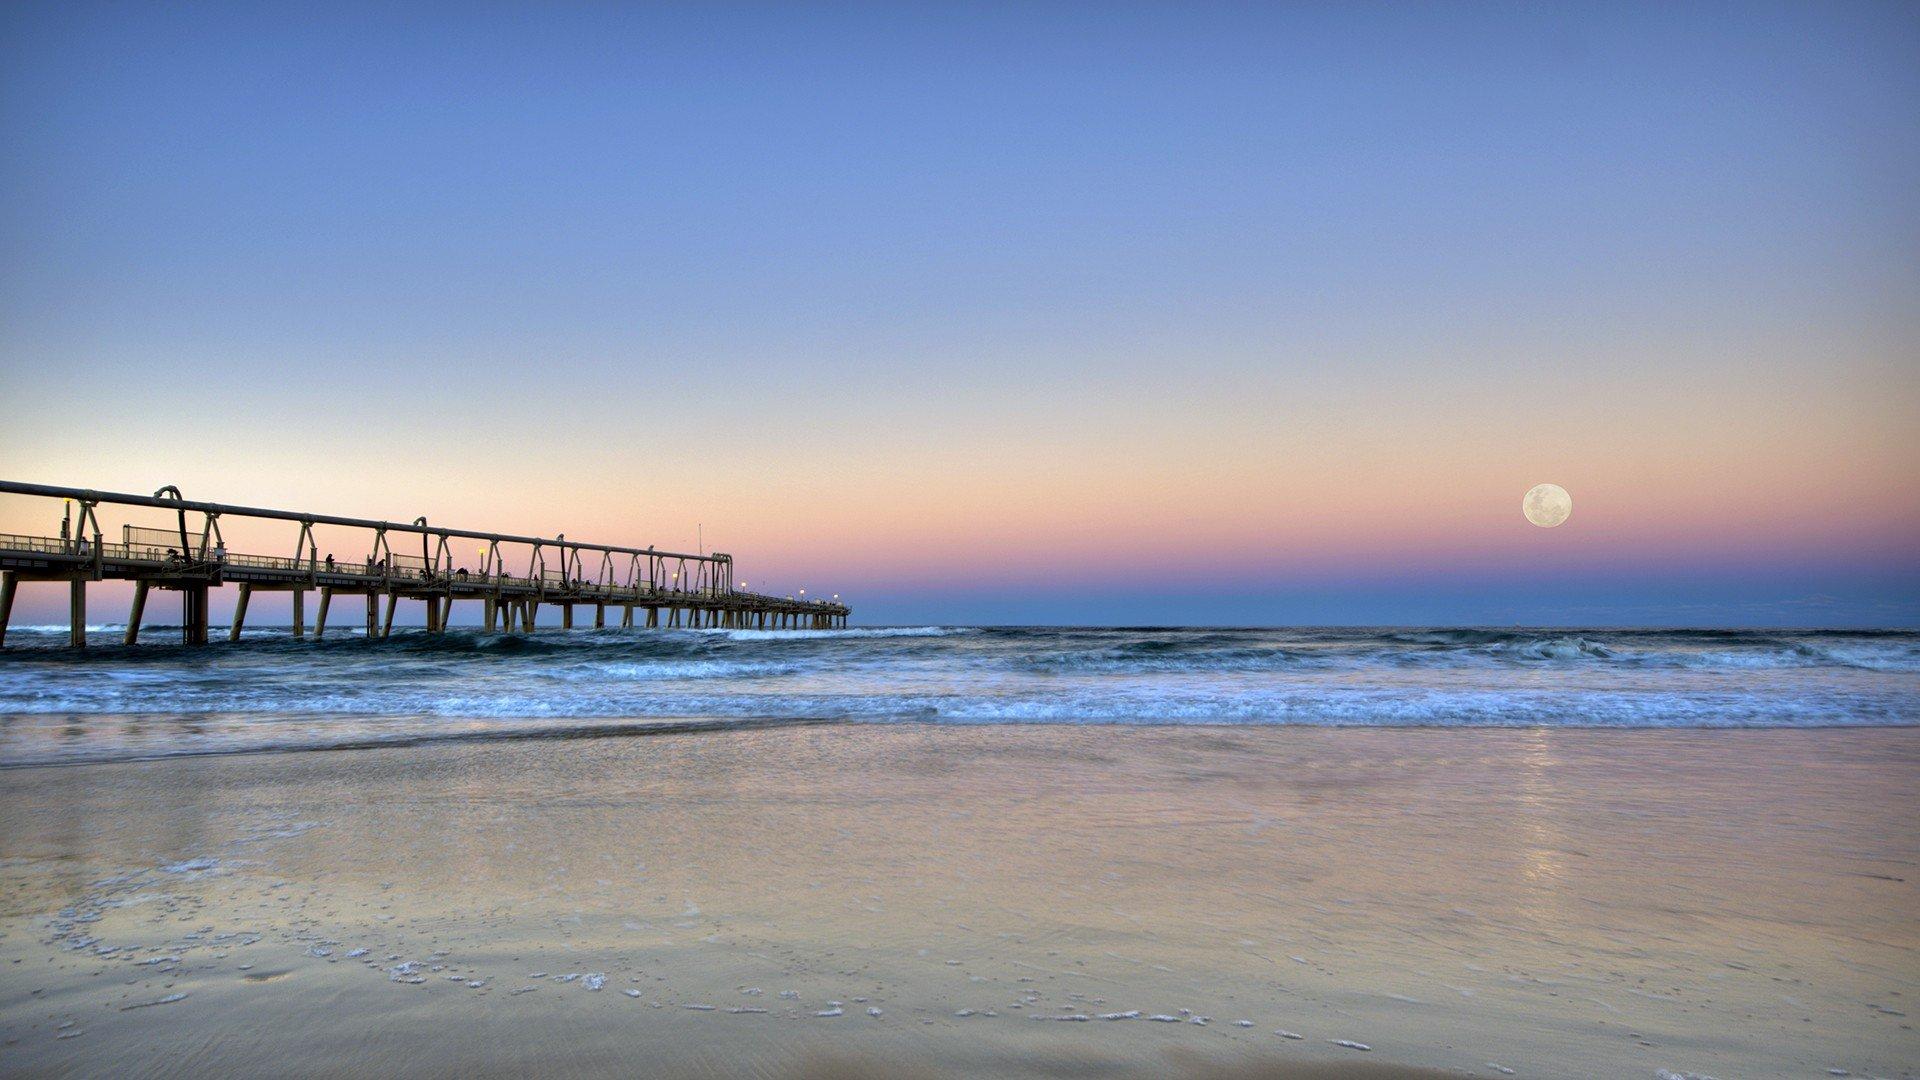 Sunset ocean landscapes nature moon australia sea beaches for Sfondi spiagge hd